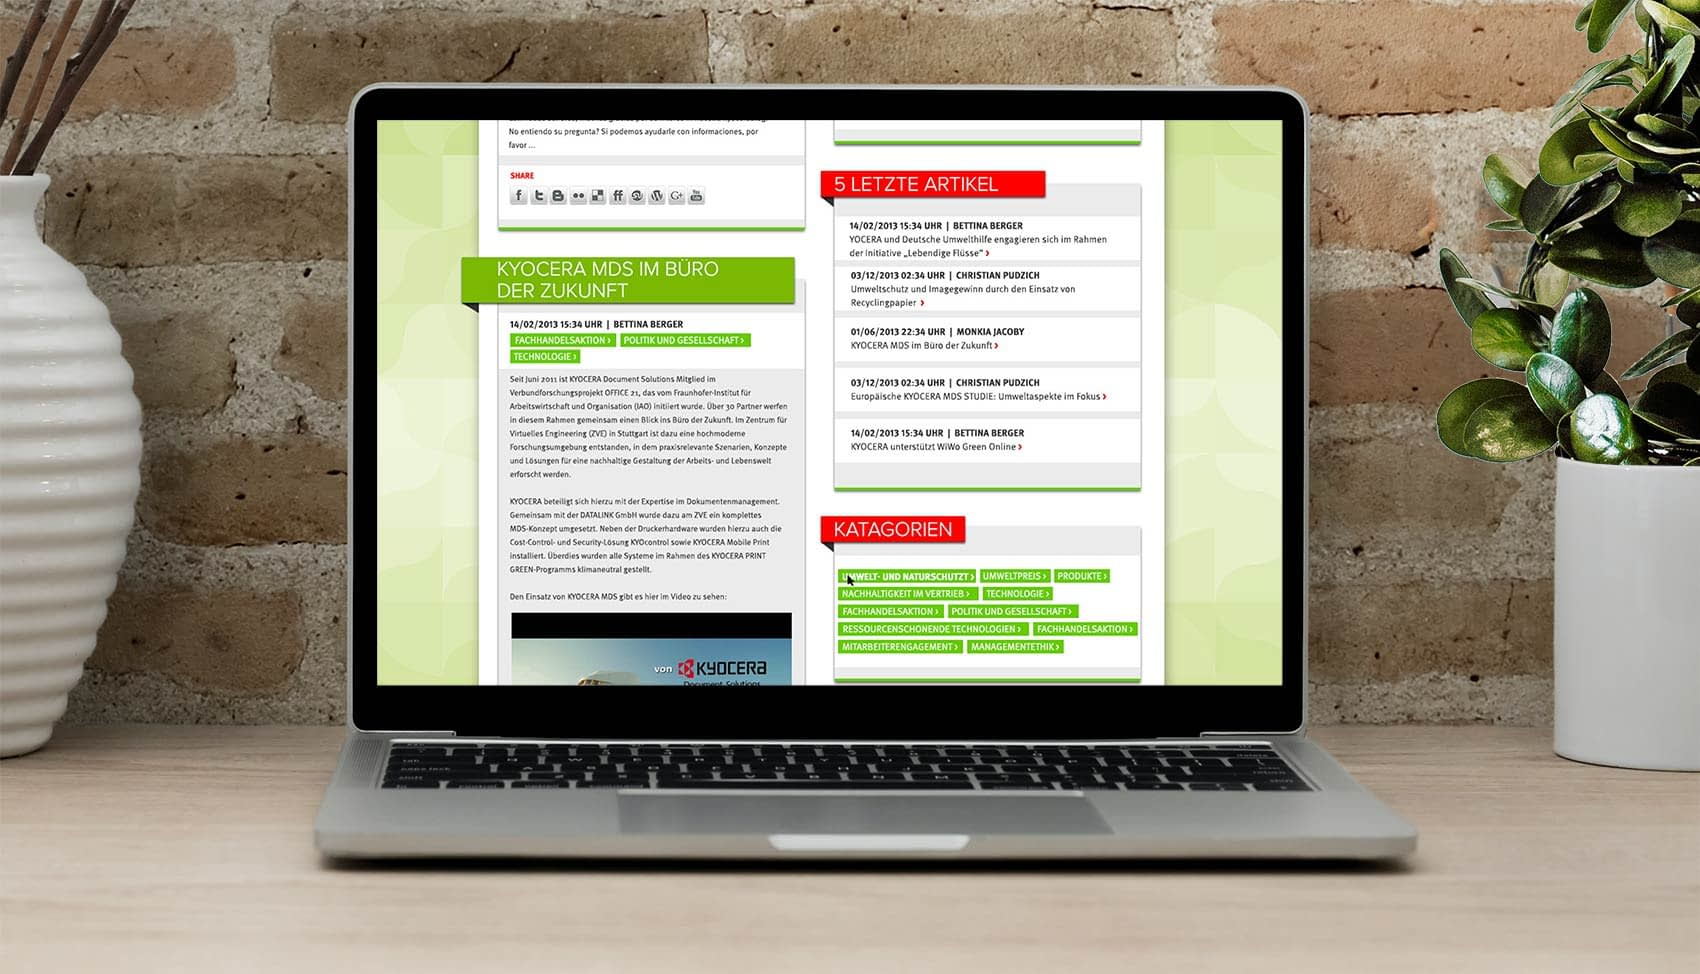 Website front end design screen for Kyocera Documents - Kelly Gold Creative Design